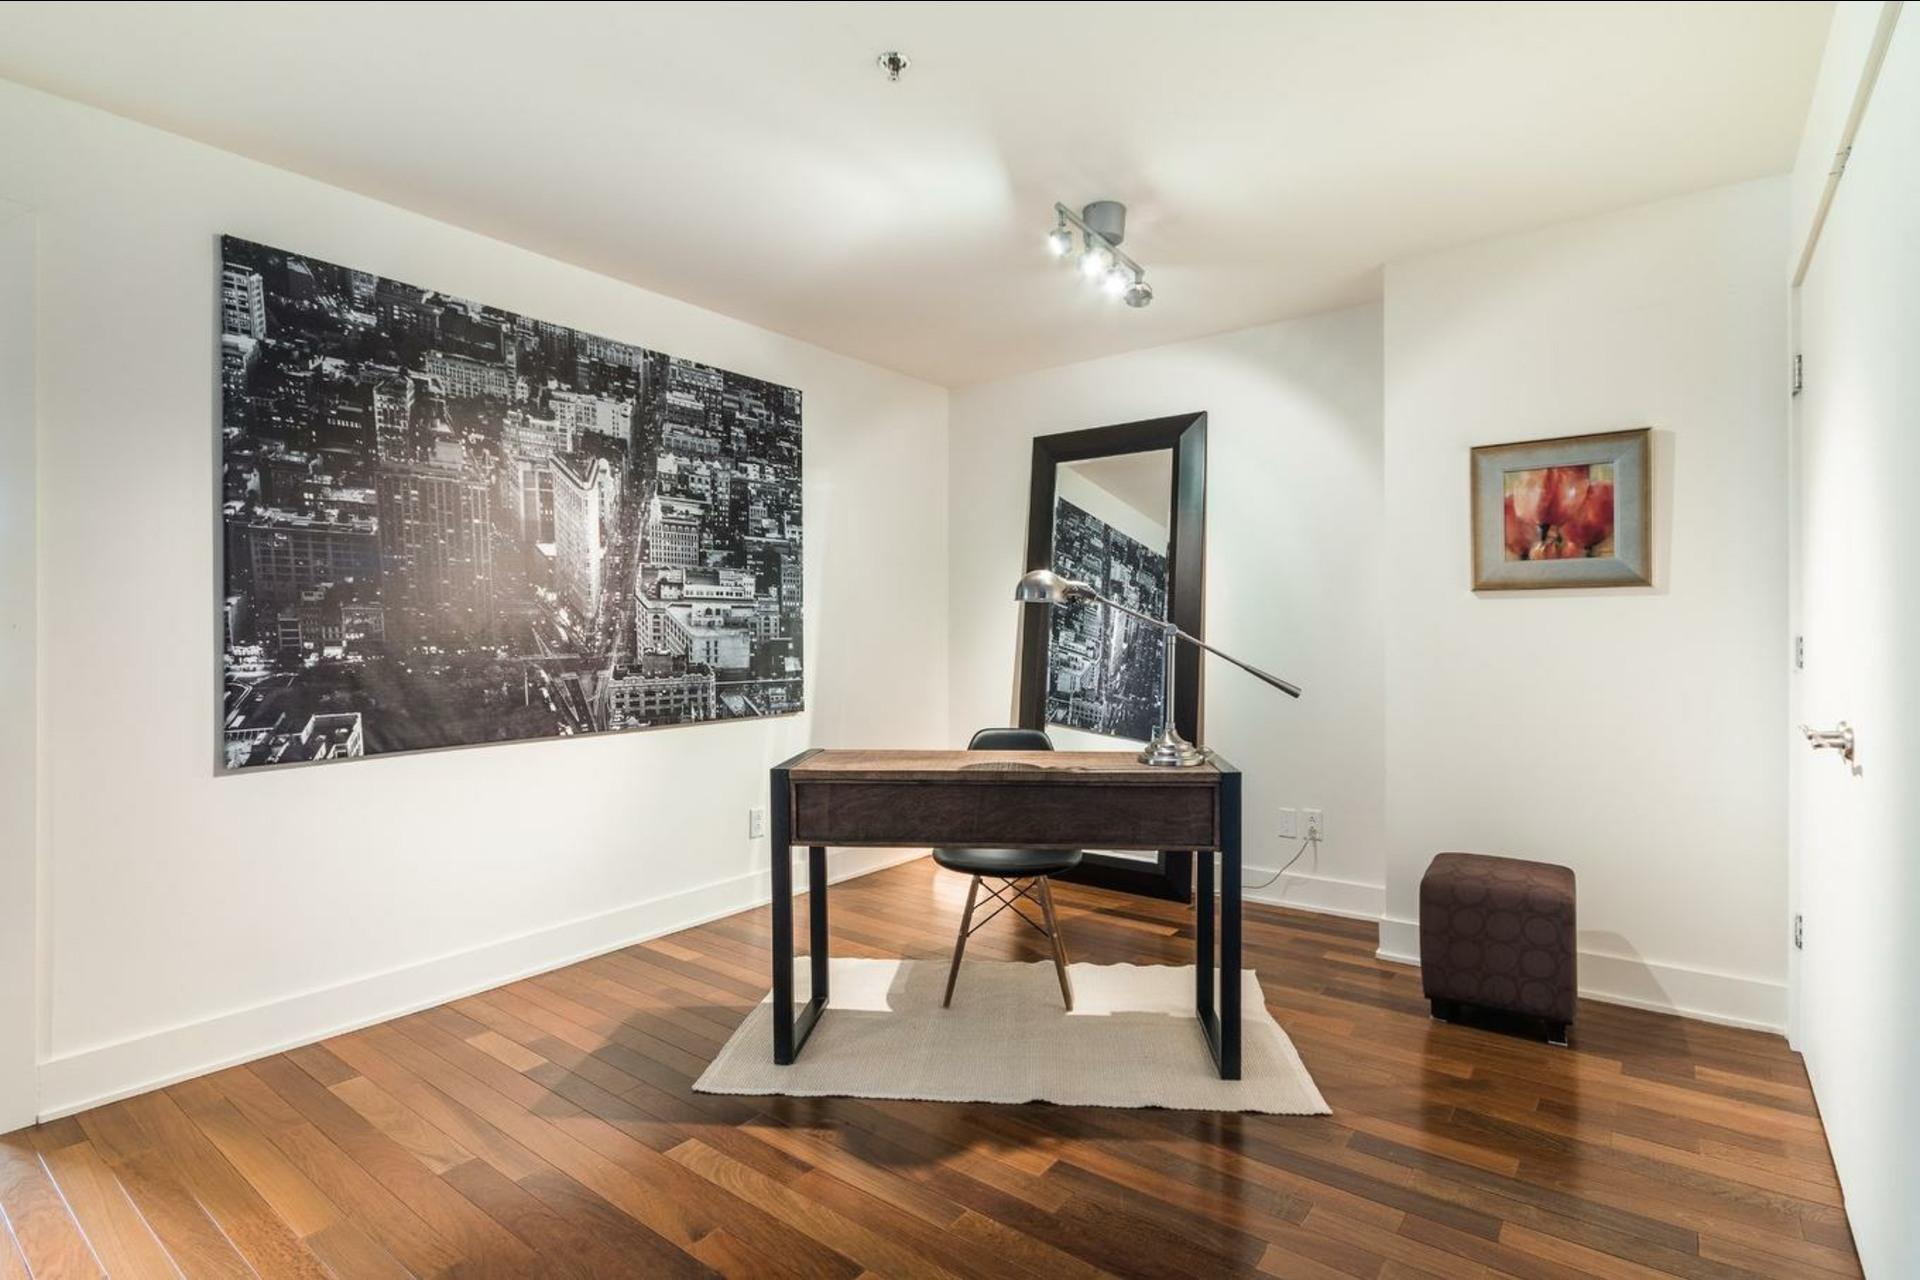 image 17 -  -  - Saint-Bruno-de-Montarville   - 7 室